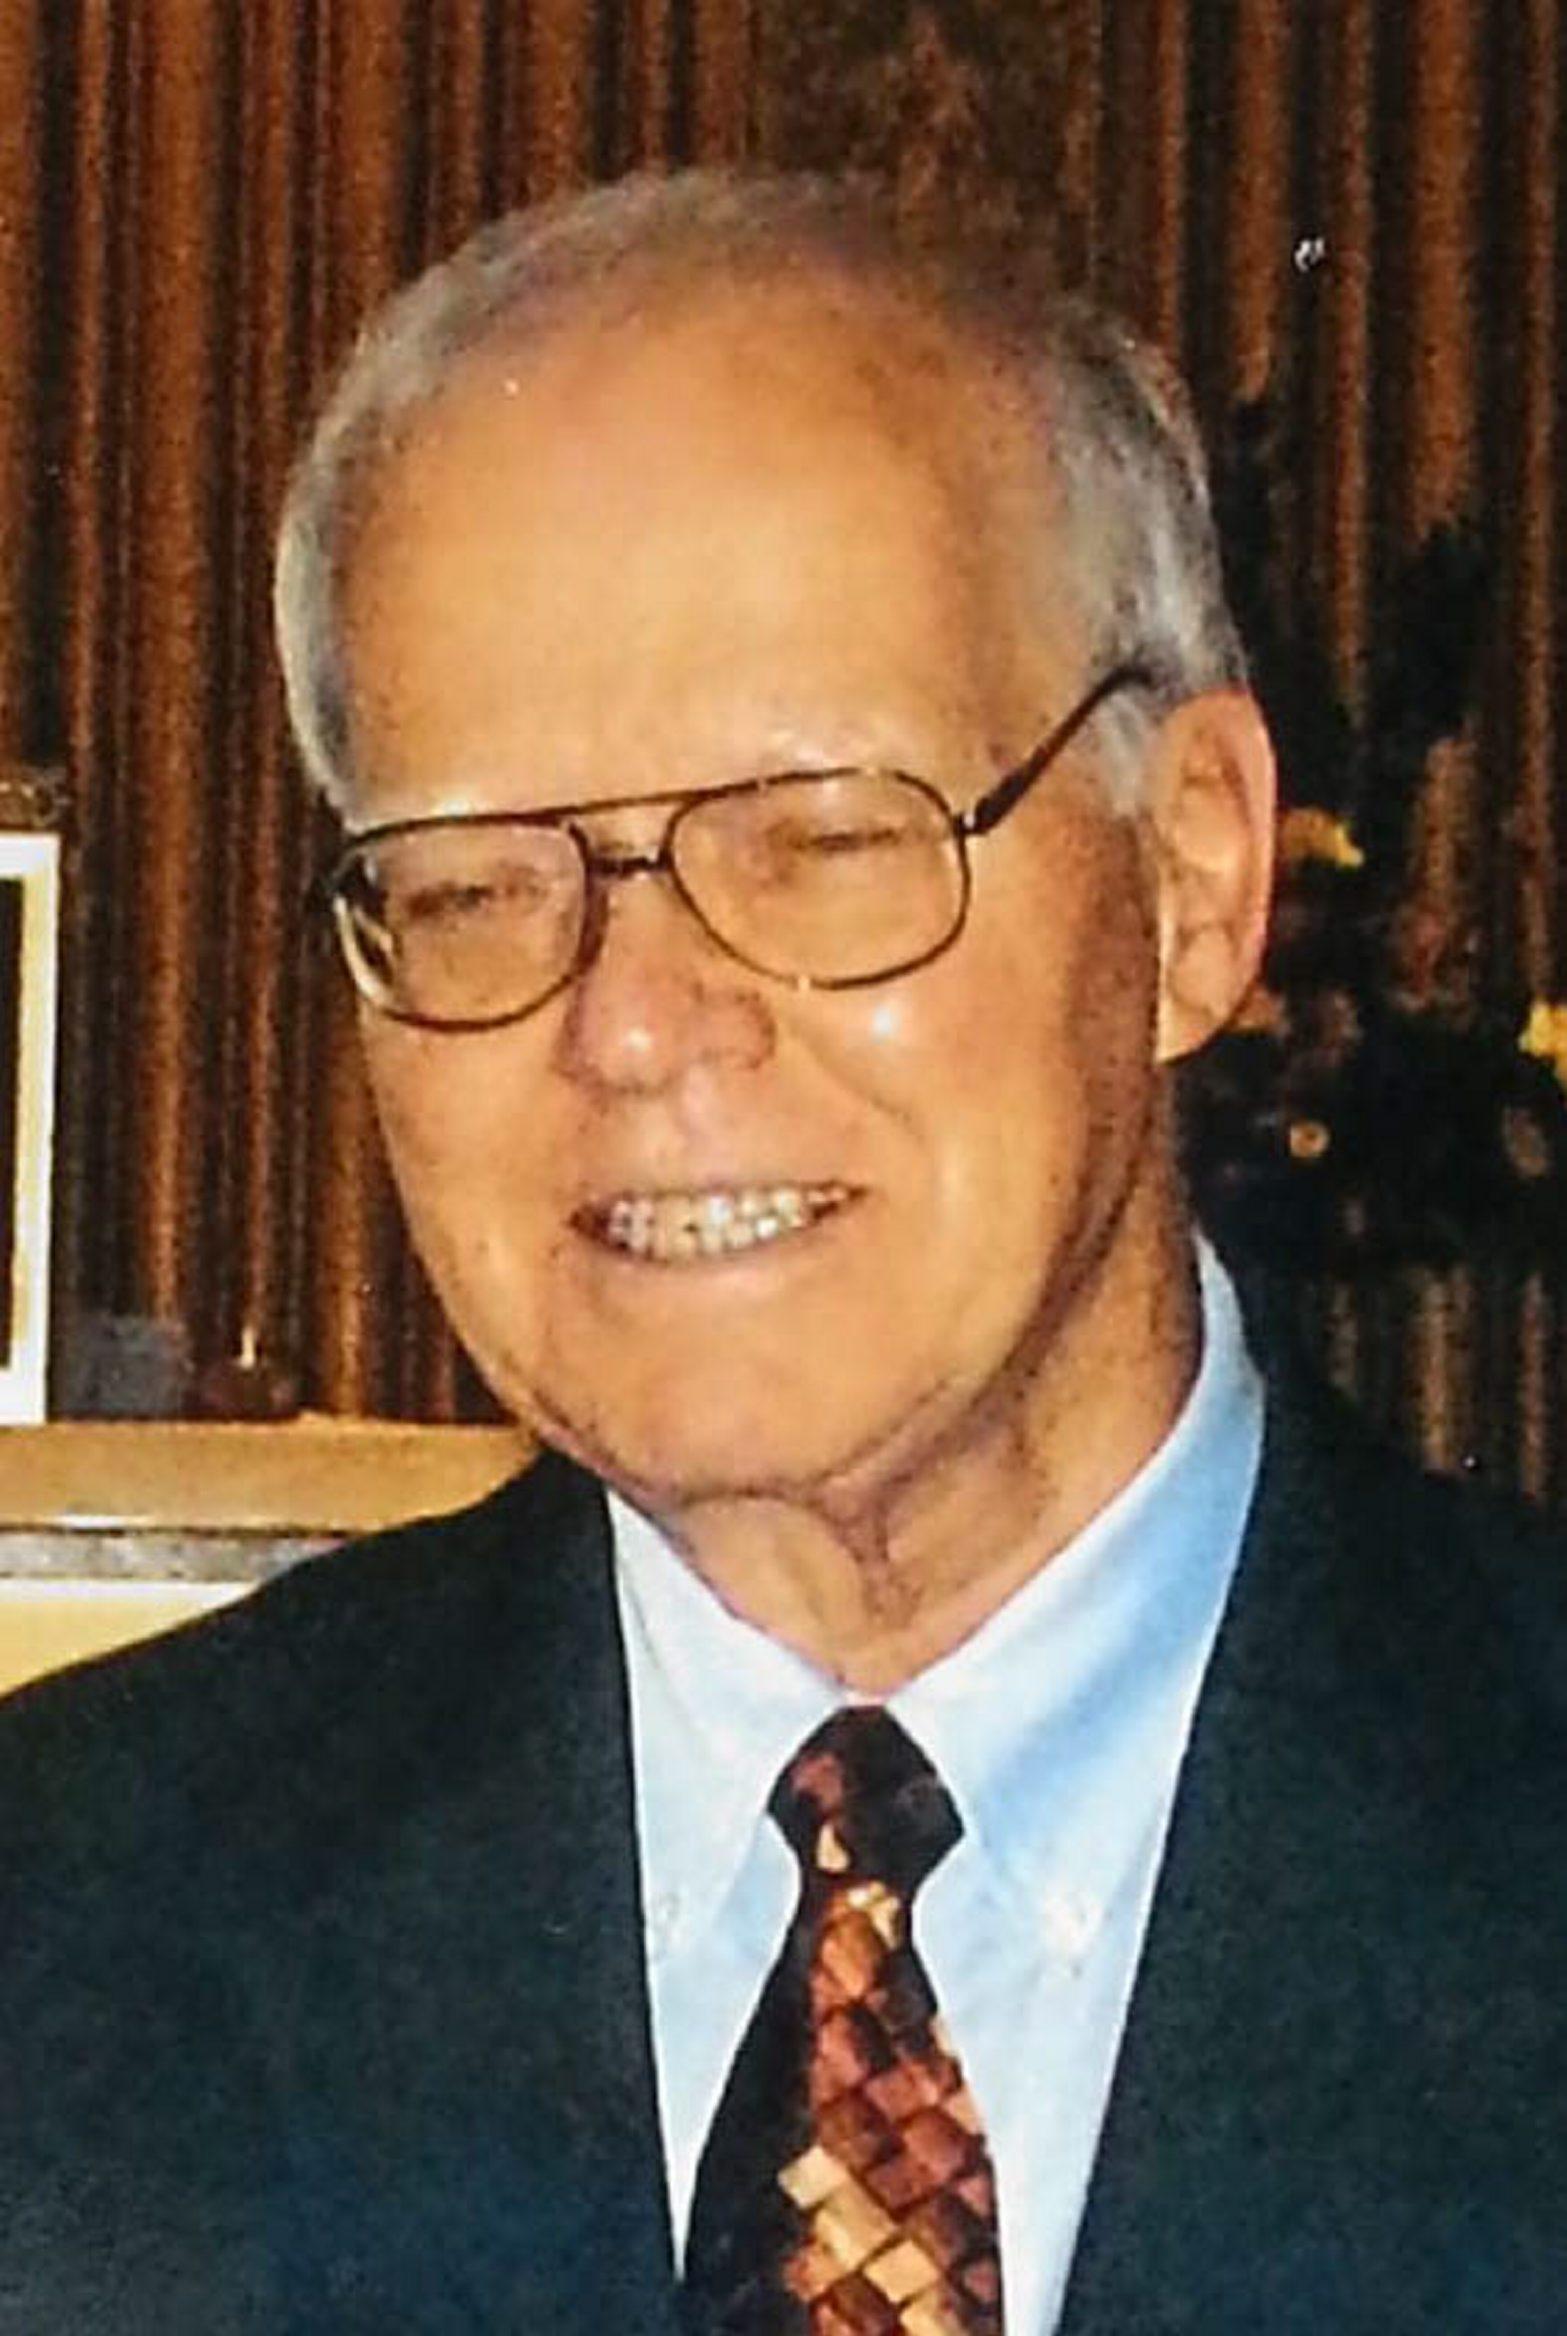 MARTIN H. HARDICK obit